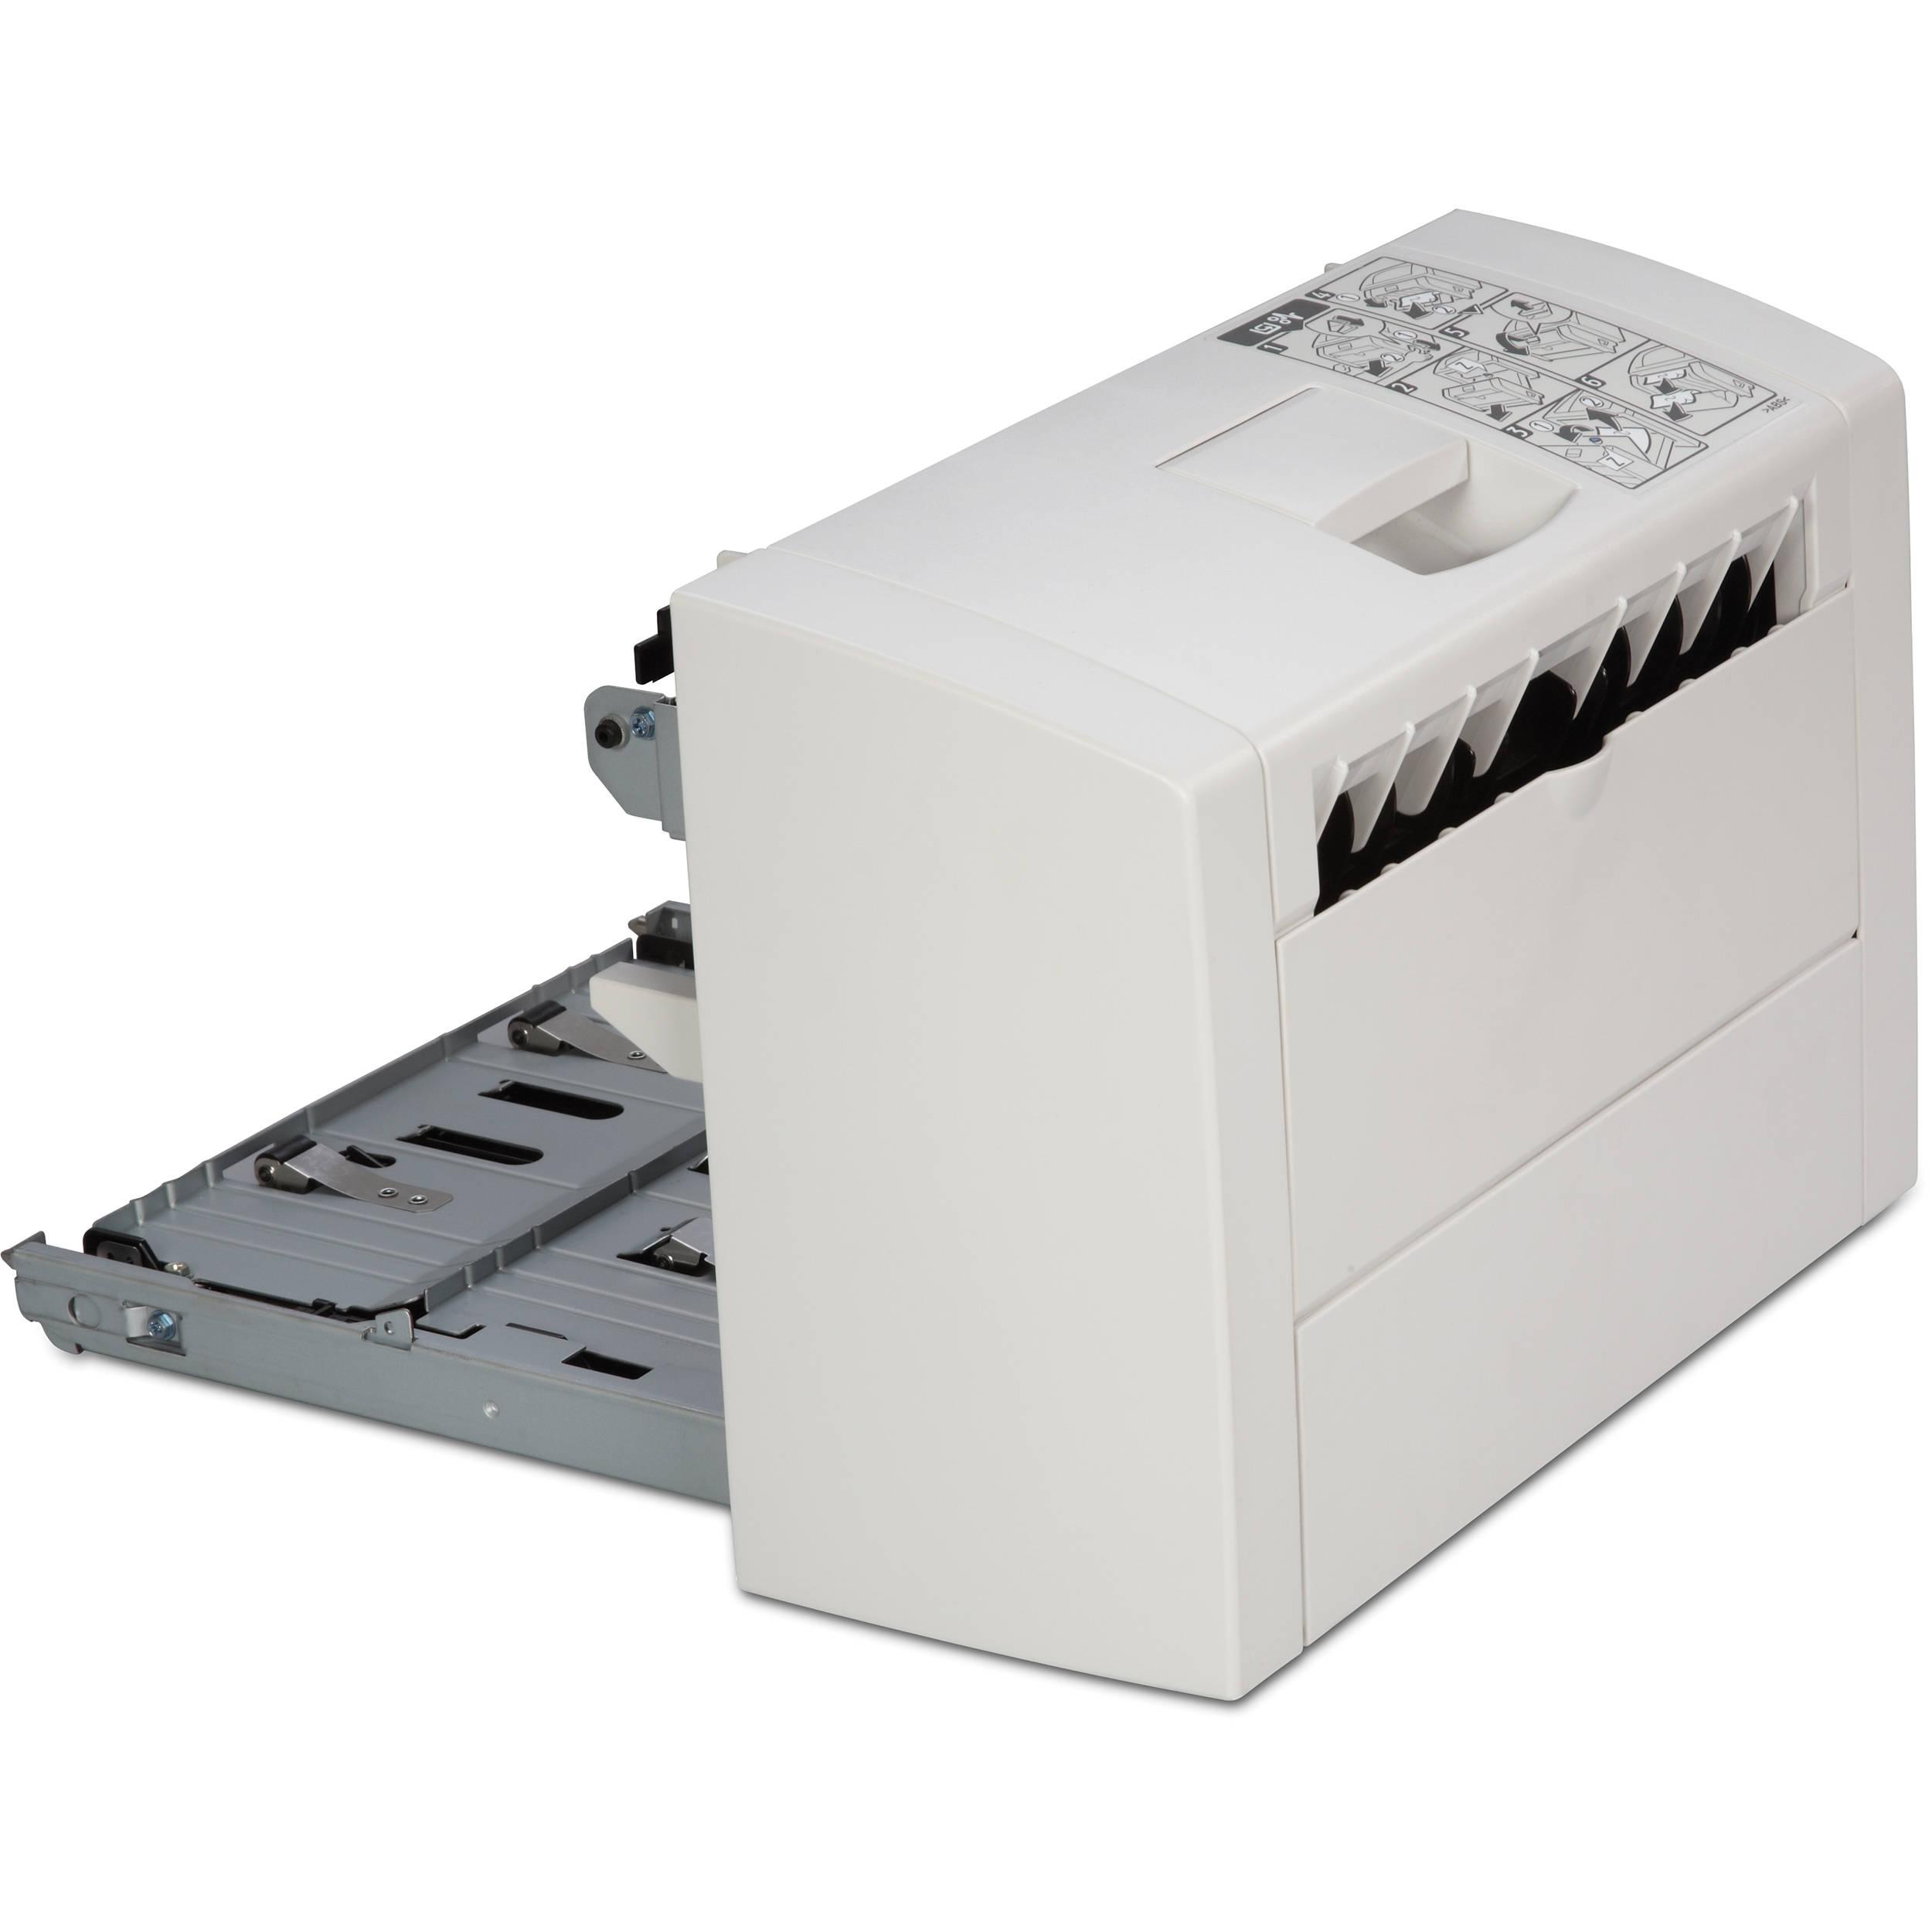 Brand new ricoh duplex unit ad 1000 model ebay for Duplex units